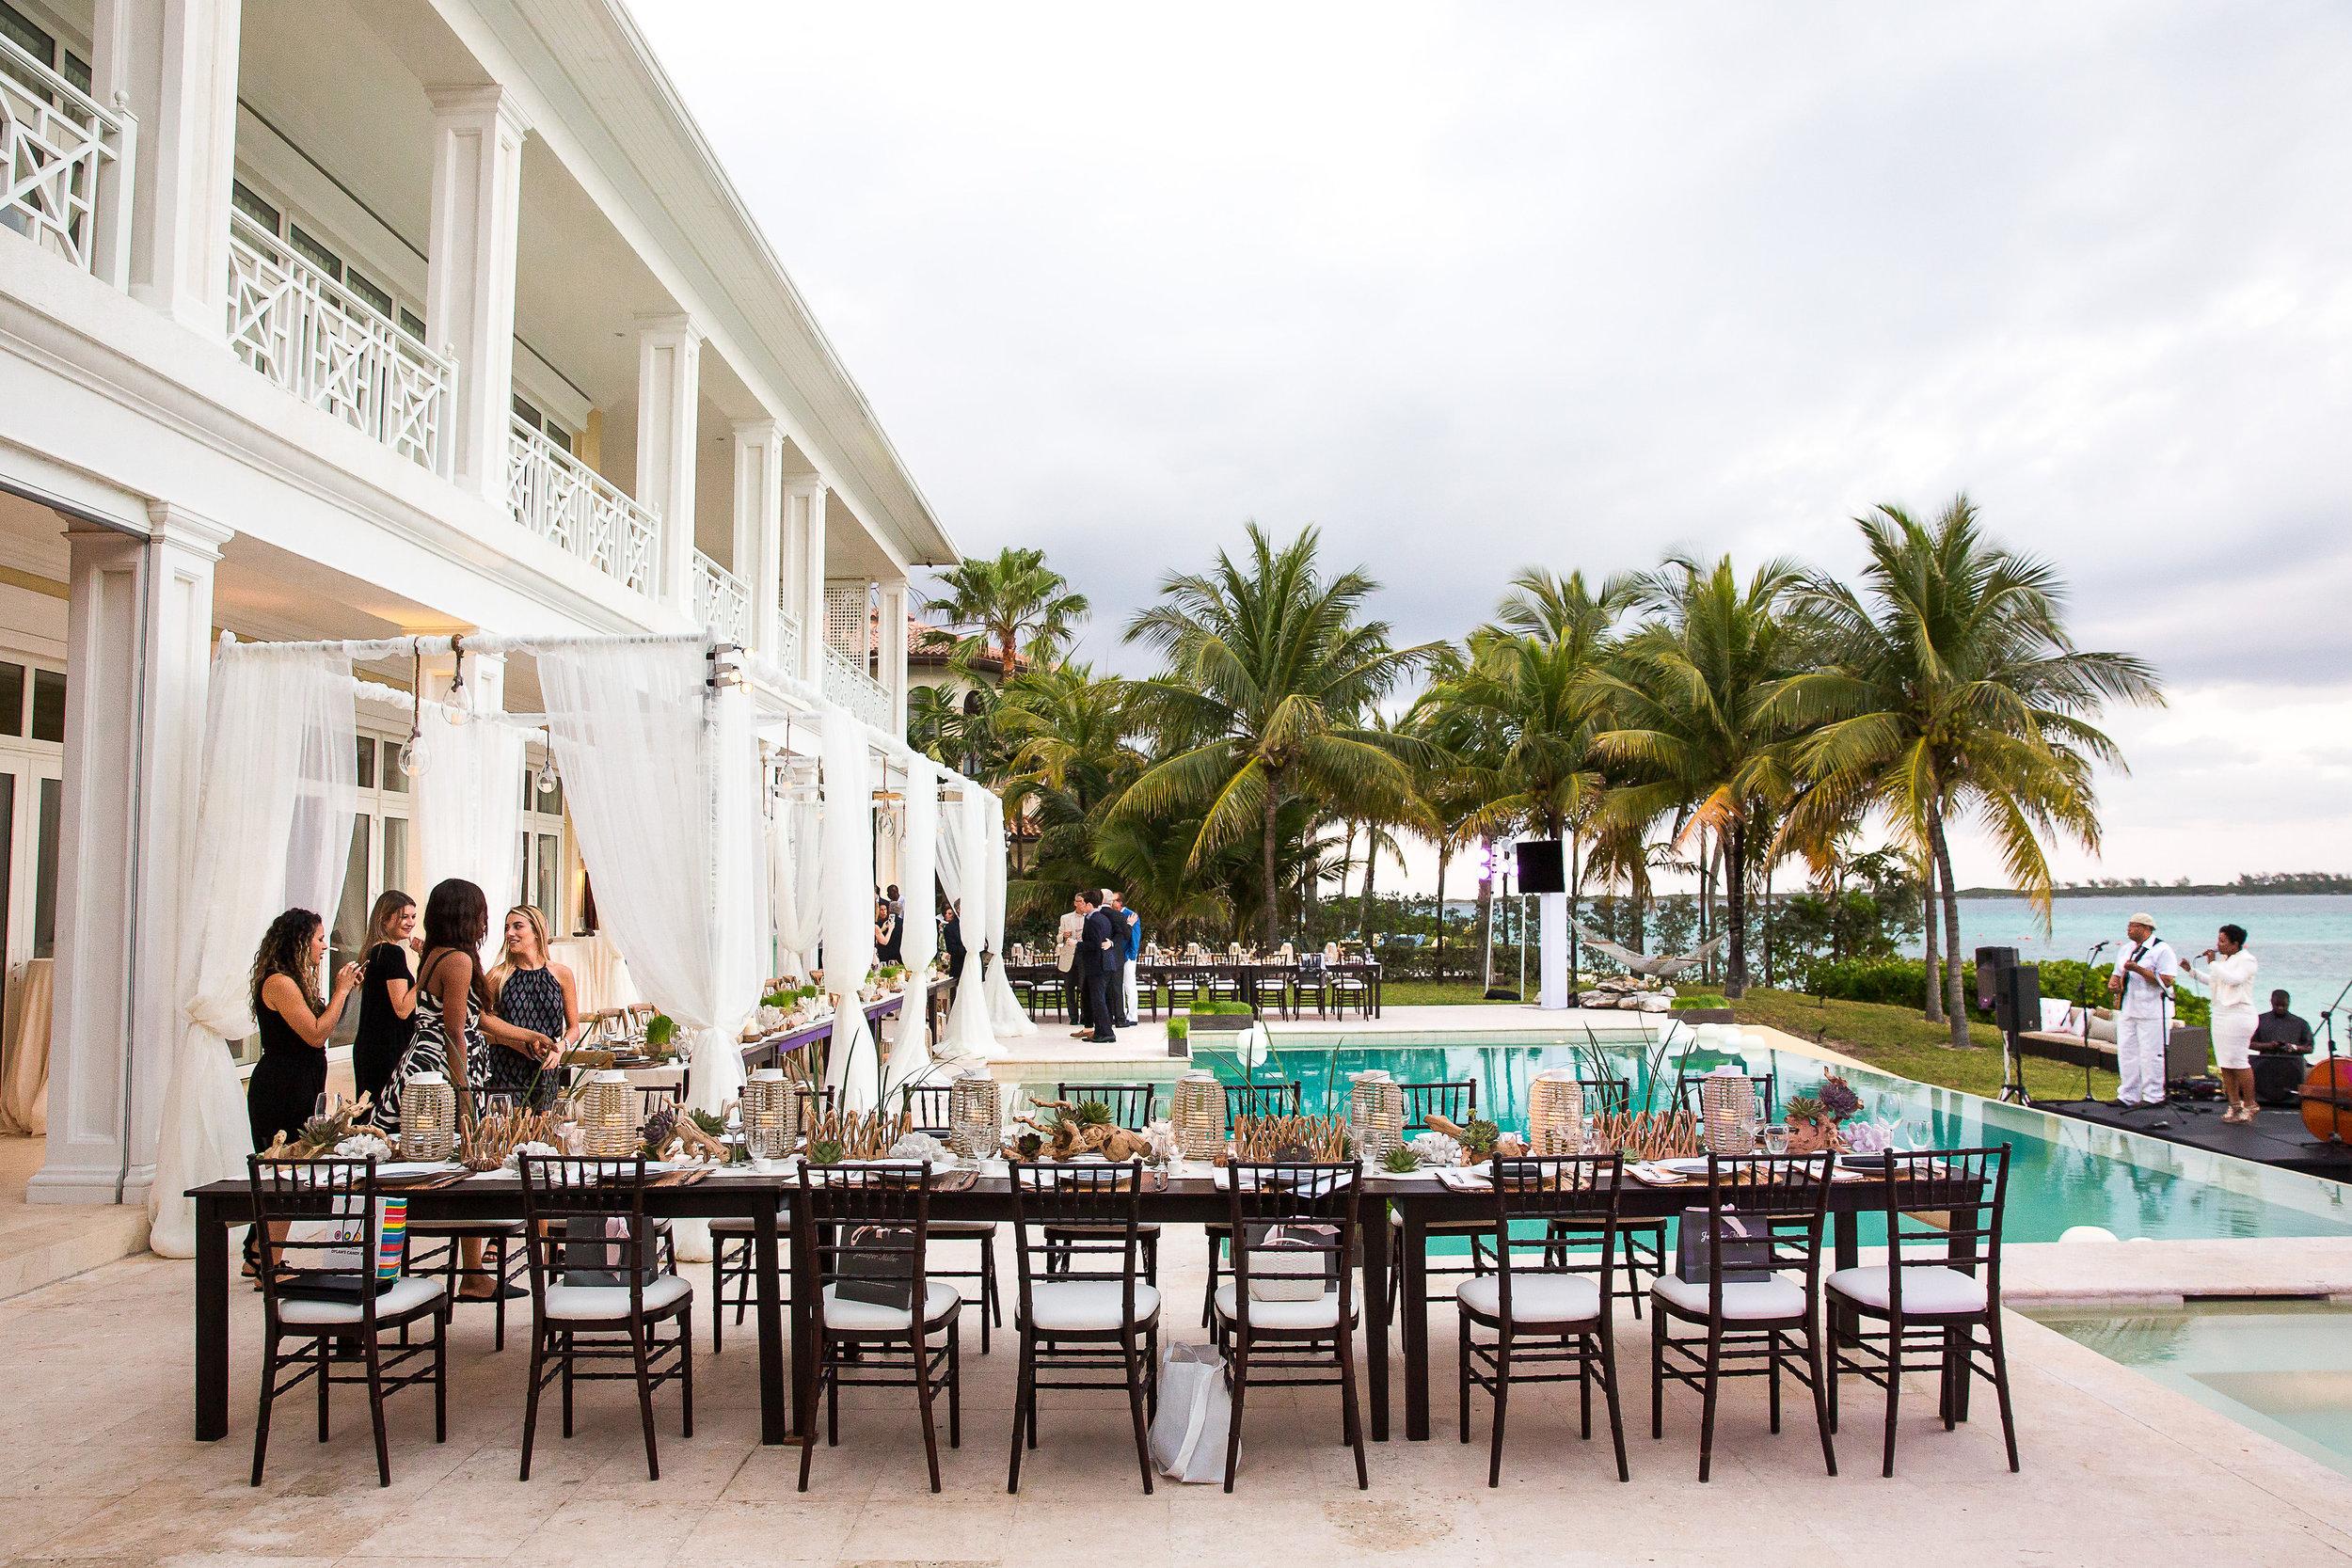 Ceci_New_York_Ceci_Style_Ceci_Johnson_Luxury_Lifestyle_Destination_Bahamas_Wedding_Letterpress_Inspiration_Design_Custom_Couture_Personalized_Invitations_11.jpg